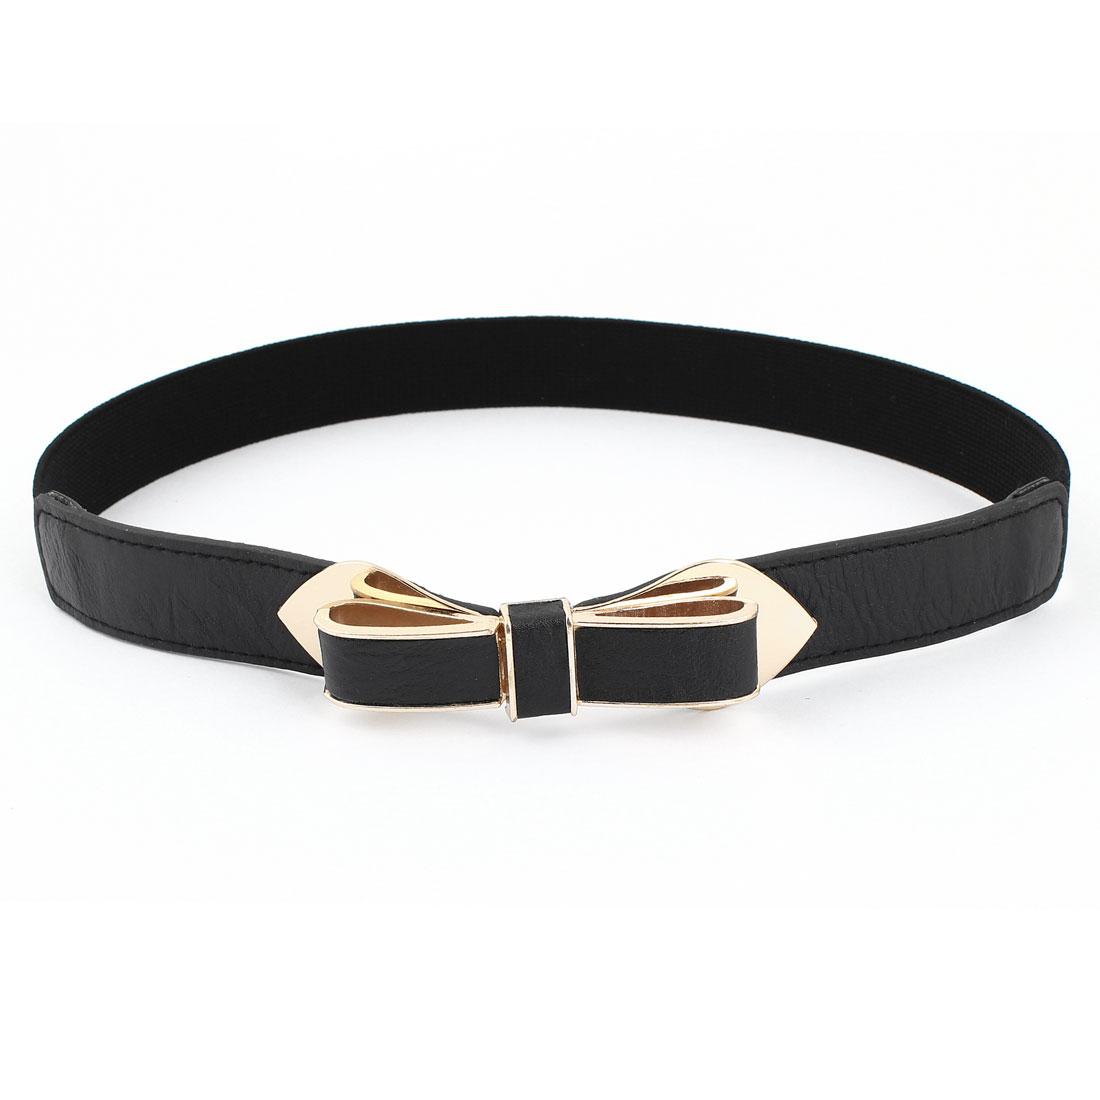 Women Bowknot Decor Interlocking Buckle Waist Cinch Belt Black 2.5cm Width